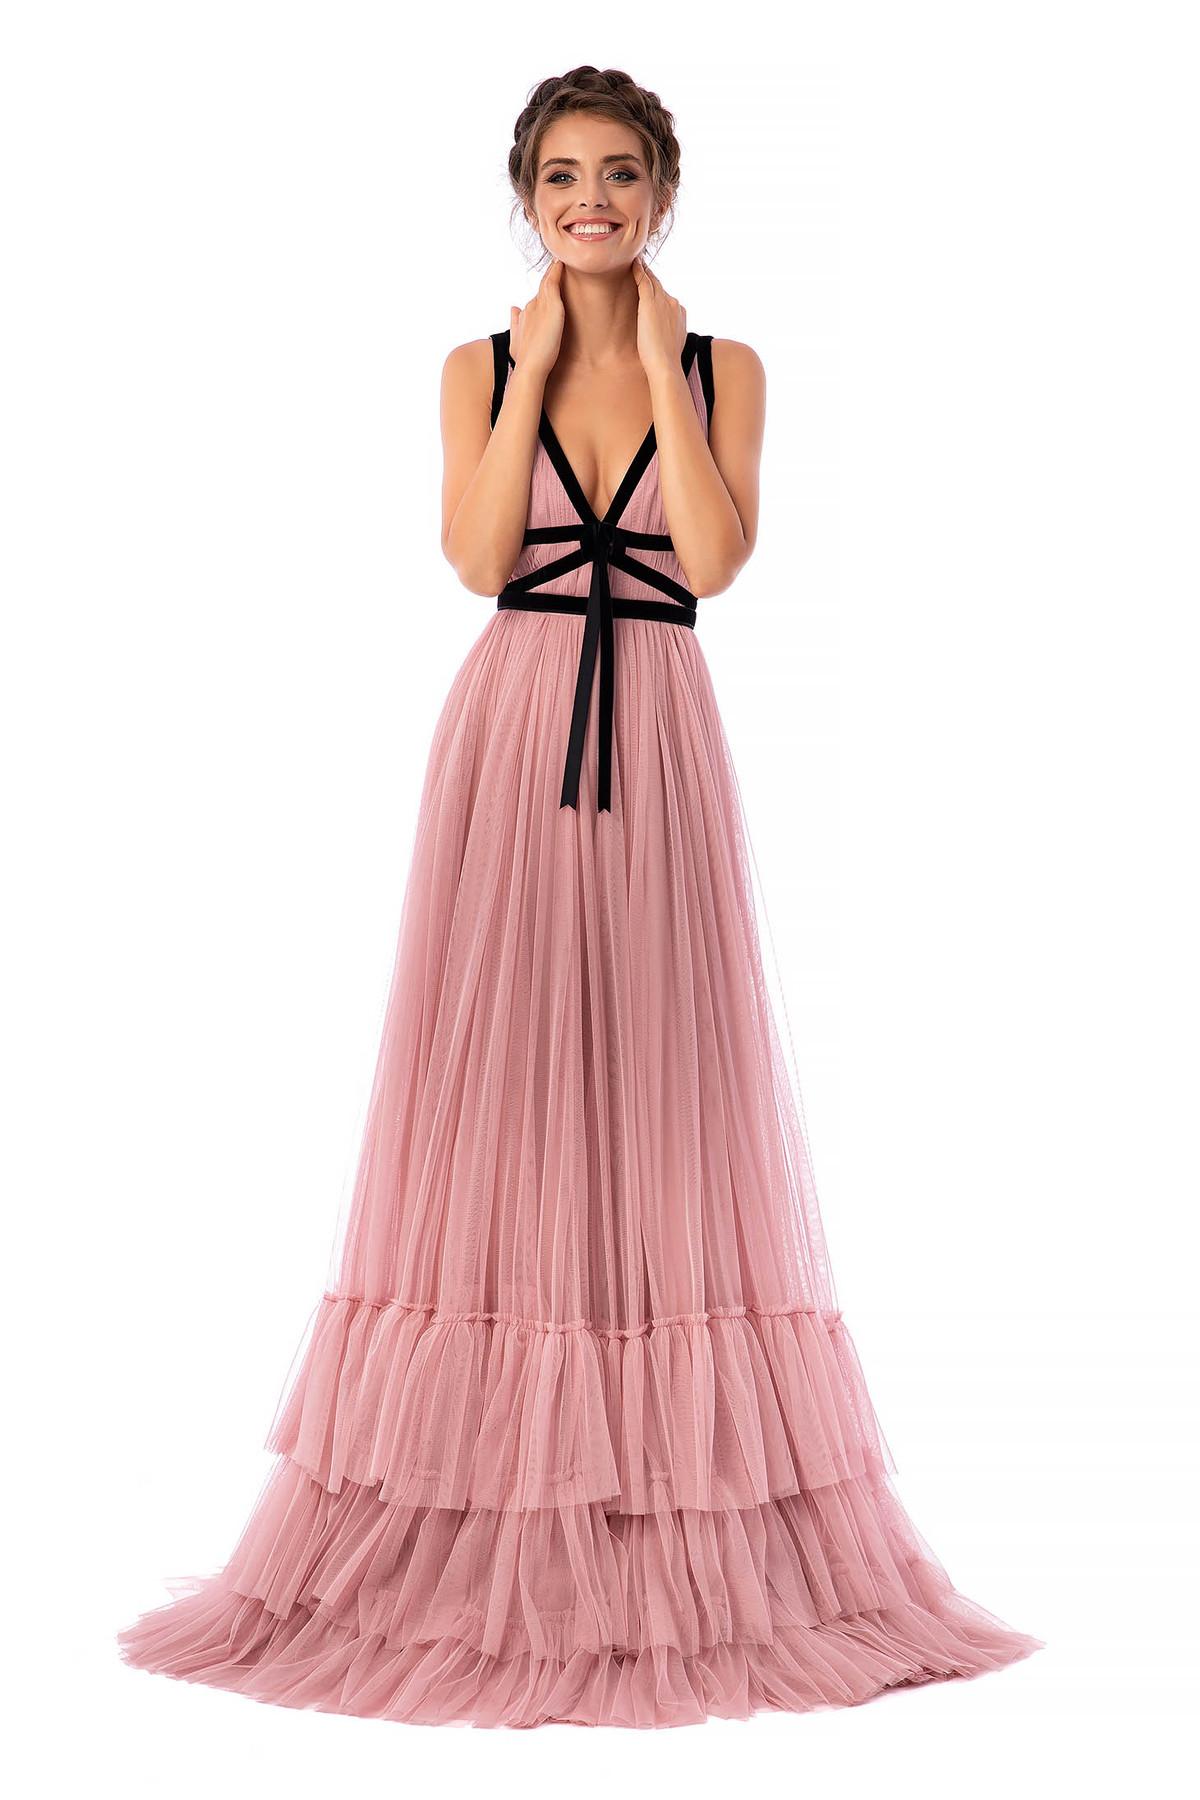 Rochie Ana Radu roz prafuit de lux lunga in clos din tul cu decolteu adanc in v cu aplicatii de catifea fara maneci